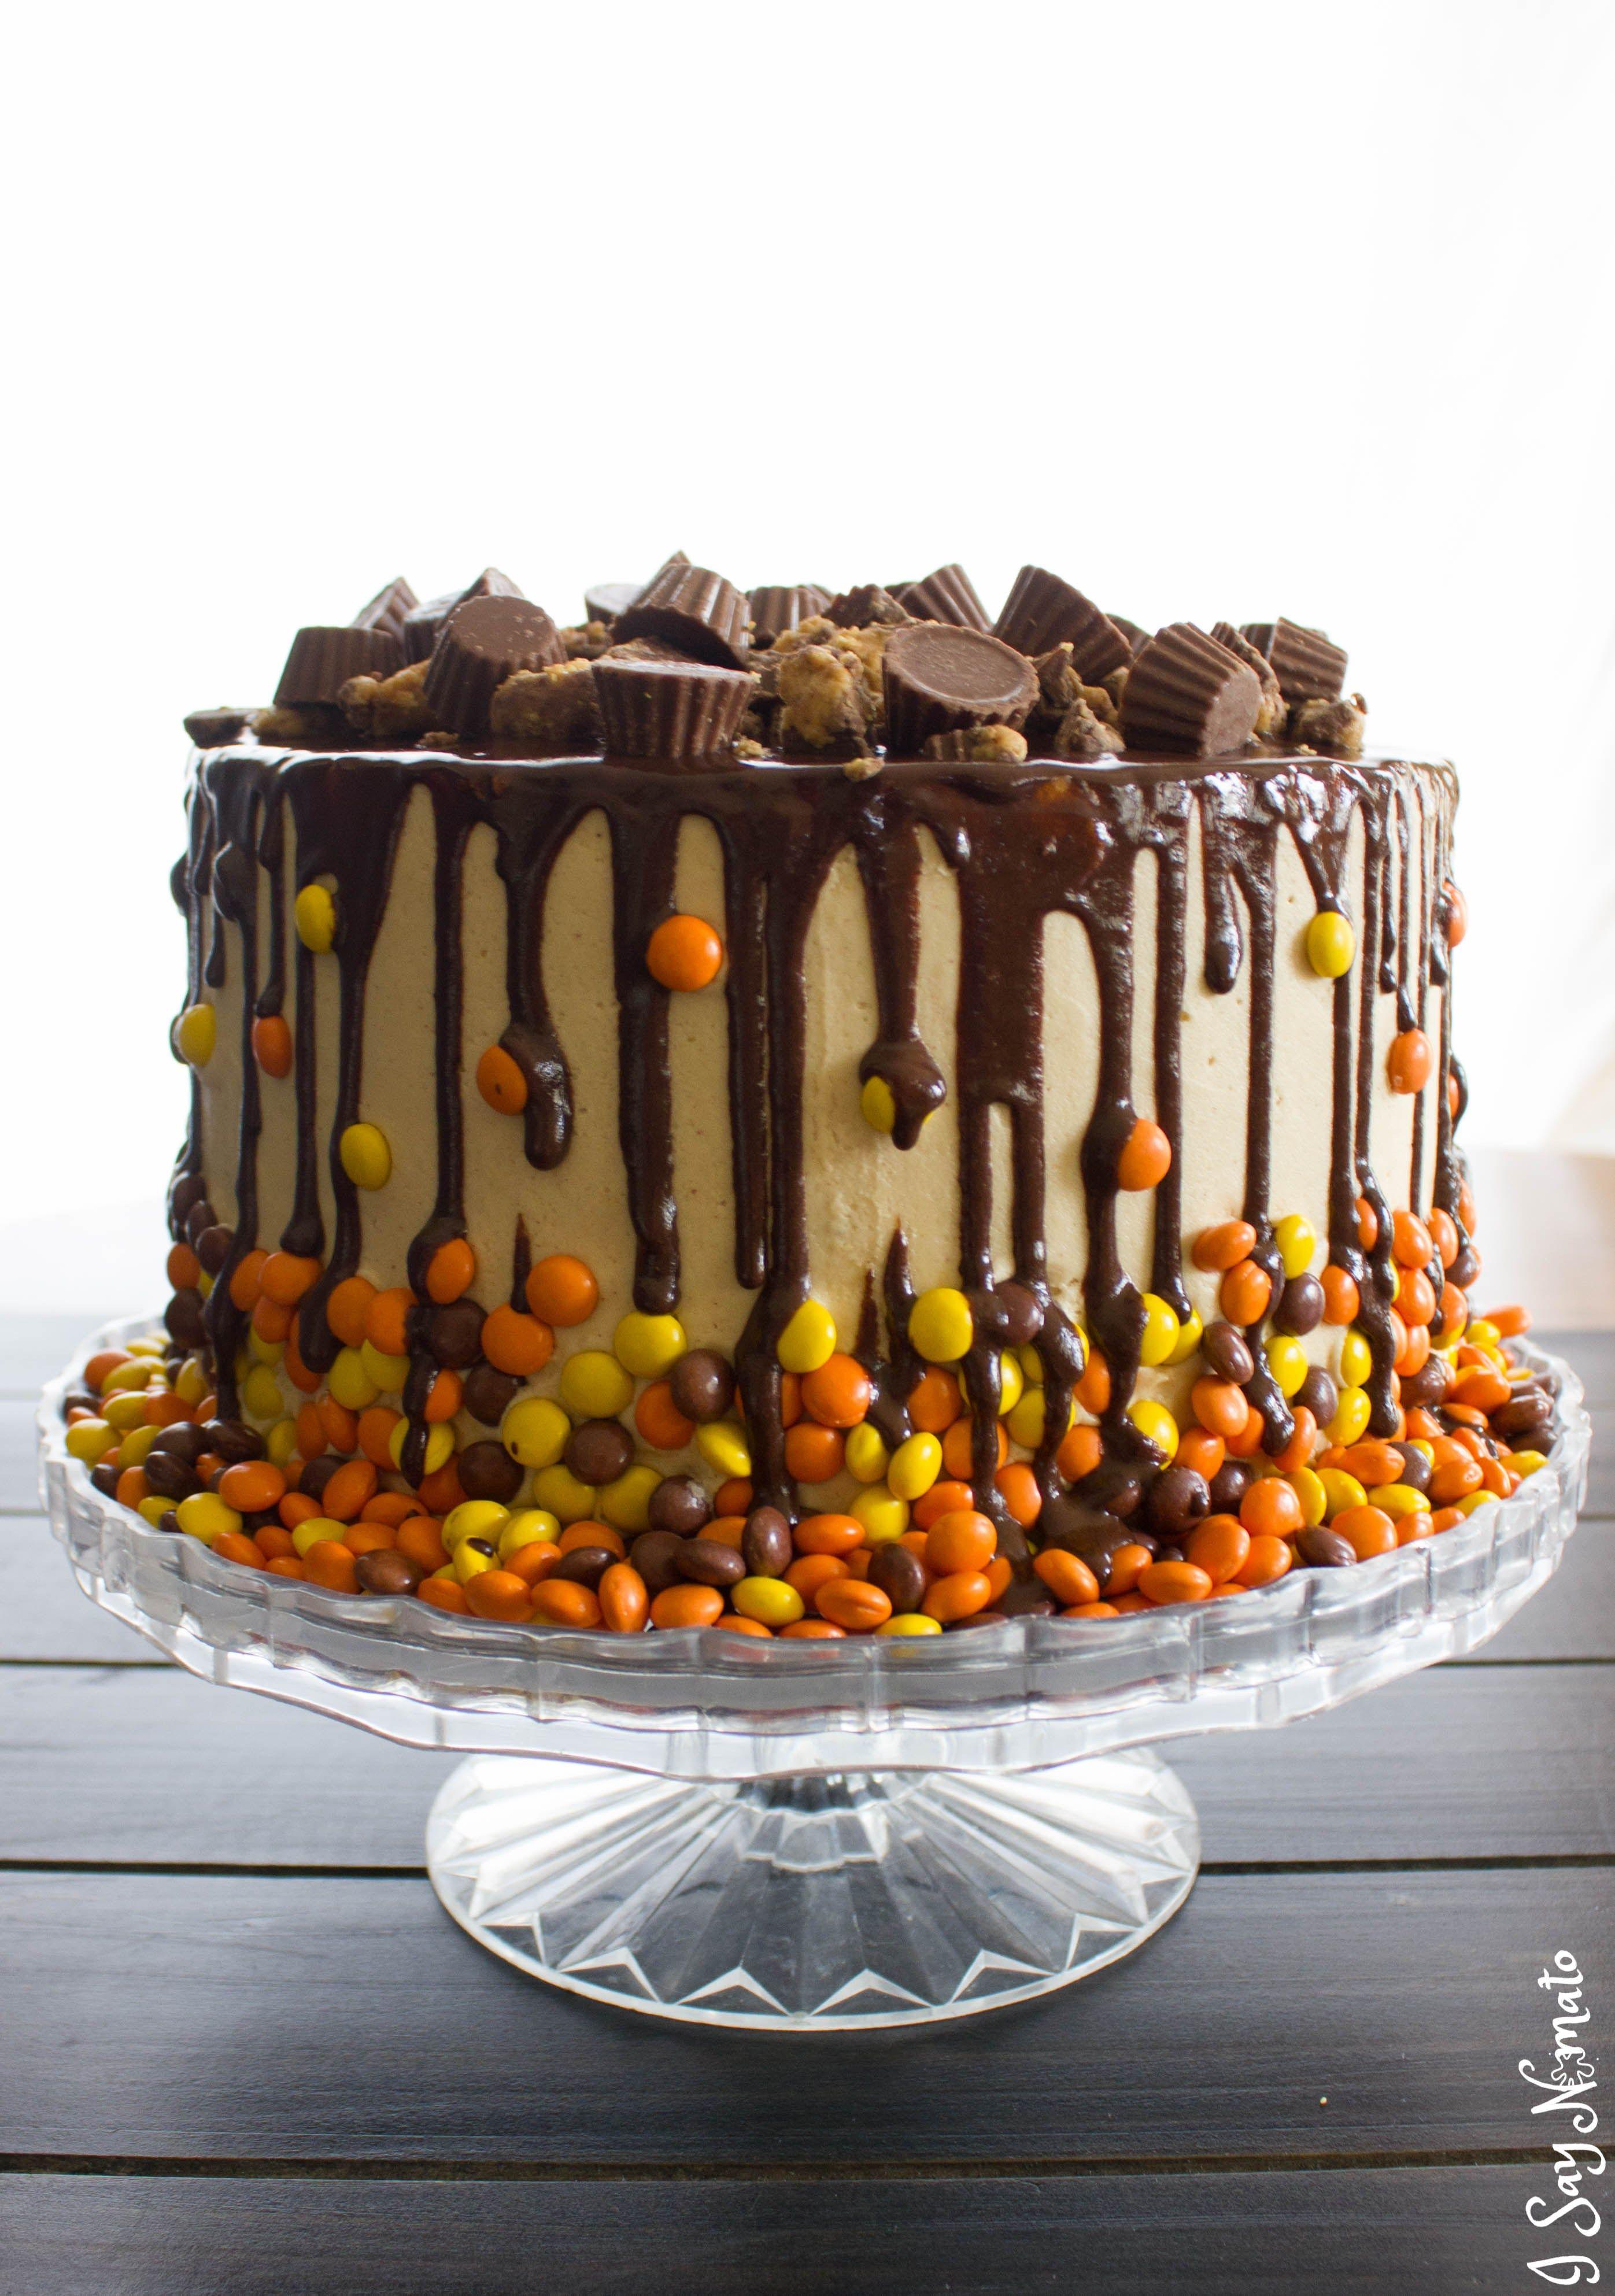 Chocolate And Peanut Butter Drip Cake Recipe Homemade Cakes